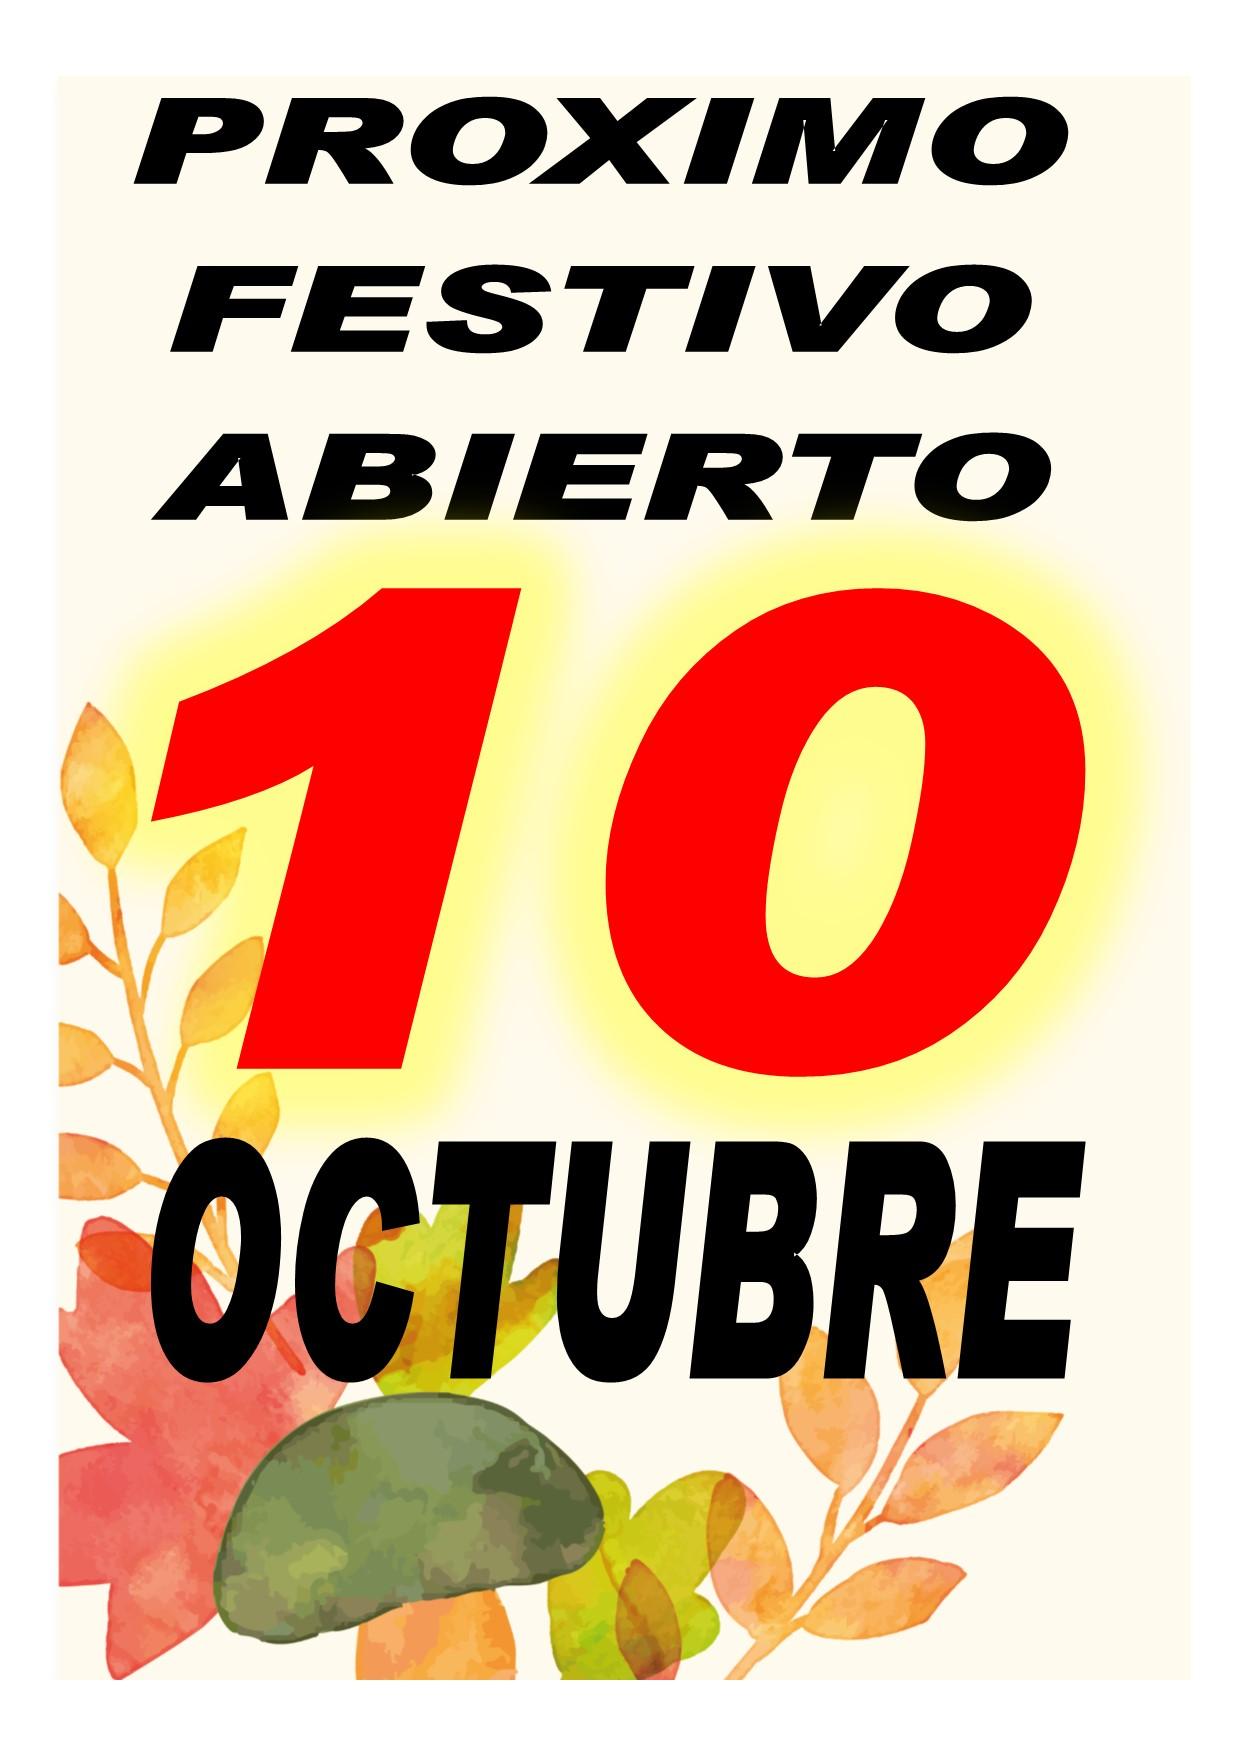 proximo festivo abierto 10 de octubre